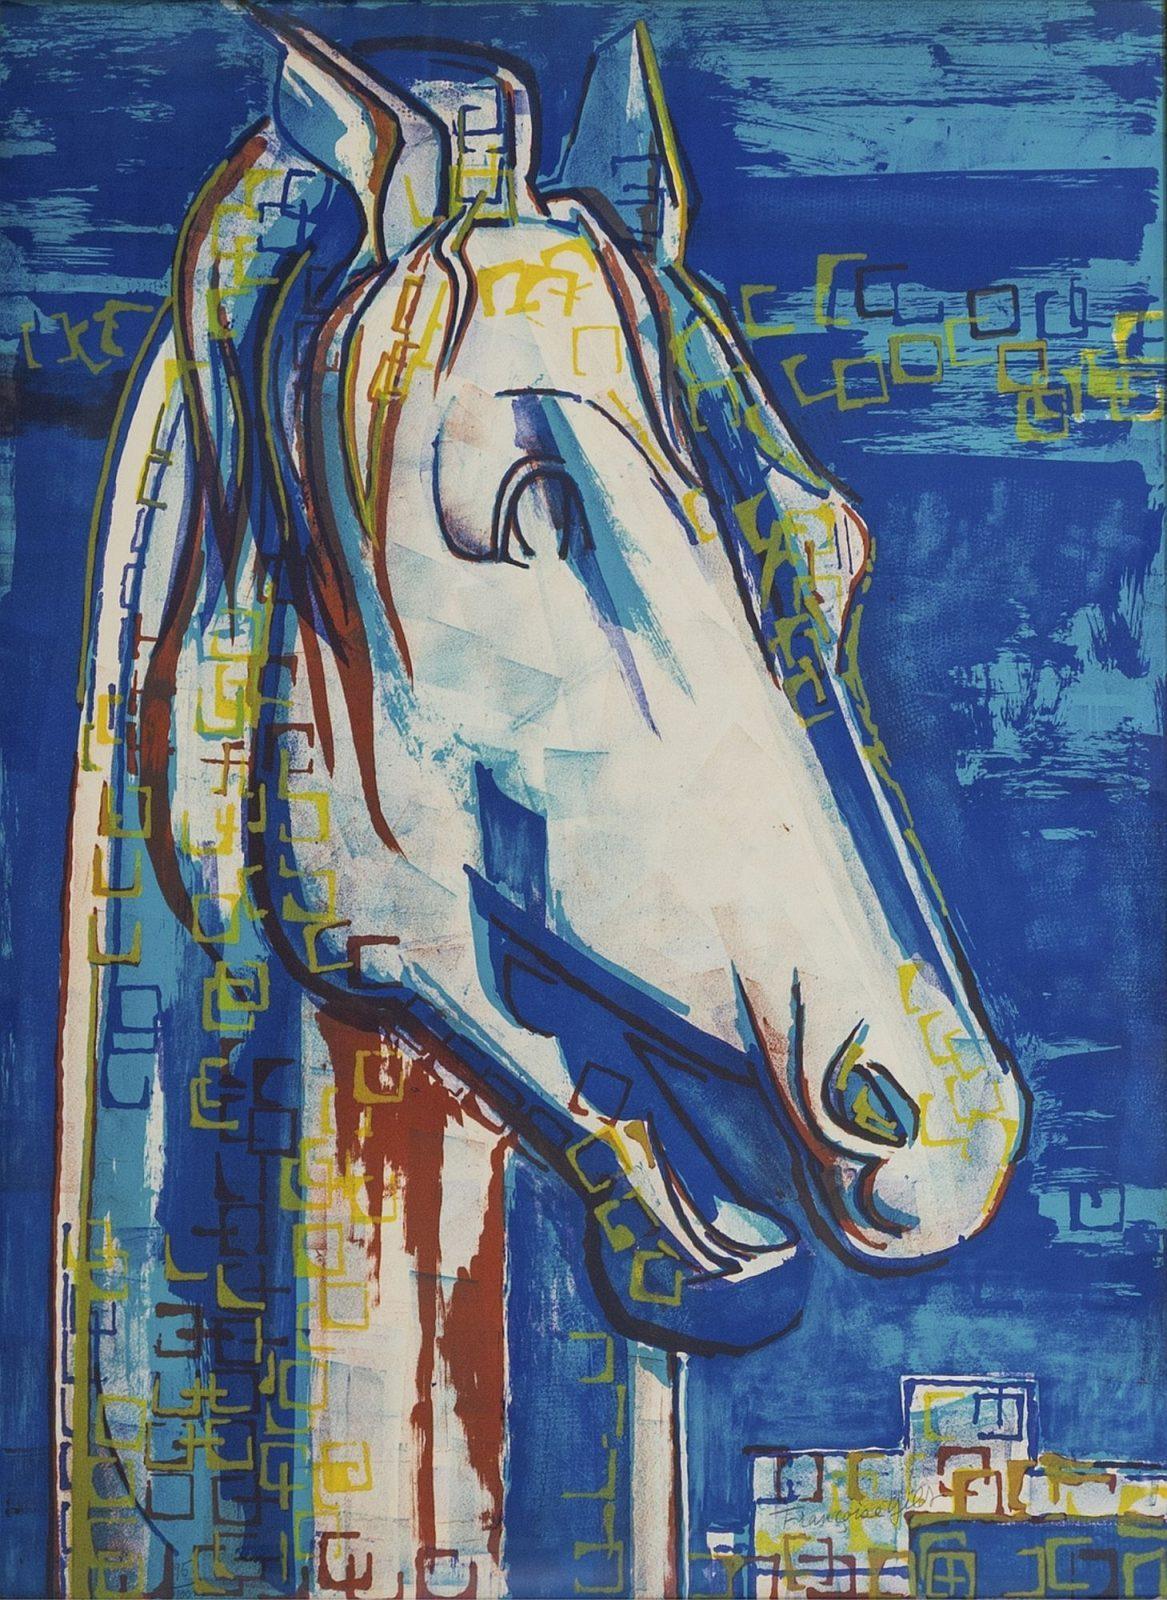 Françoise Gilot: The Greek Horse